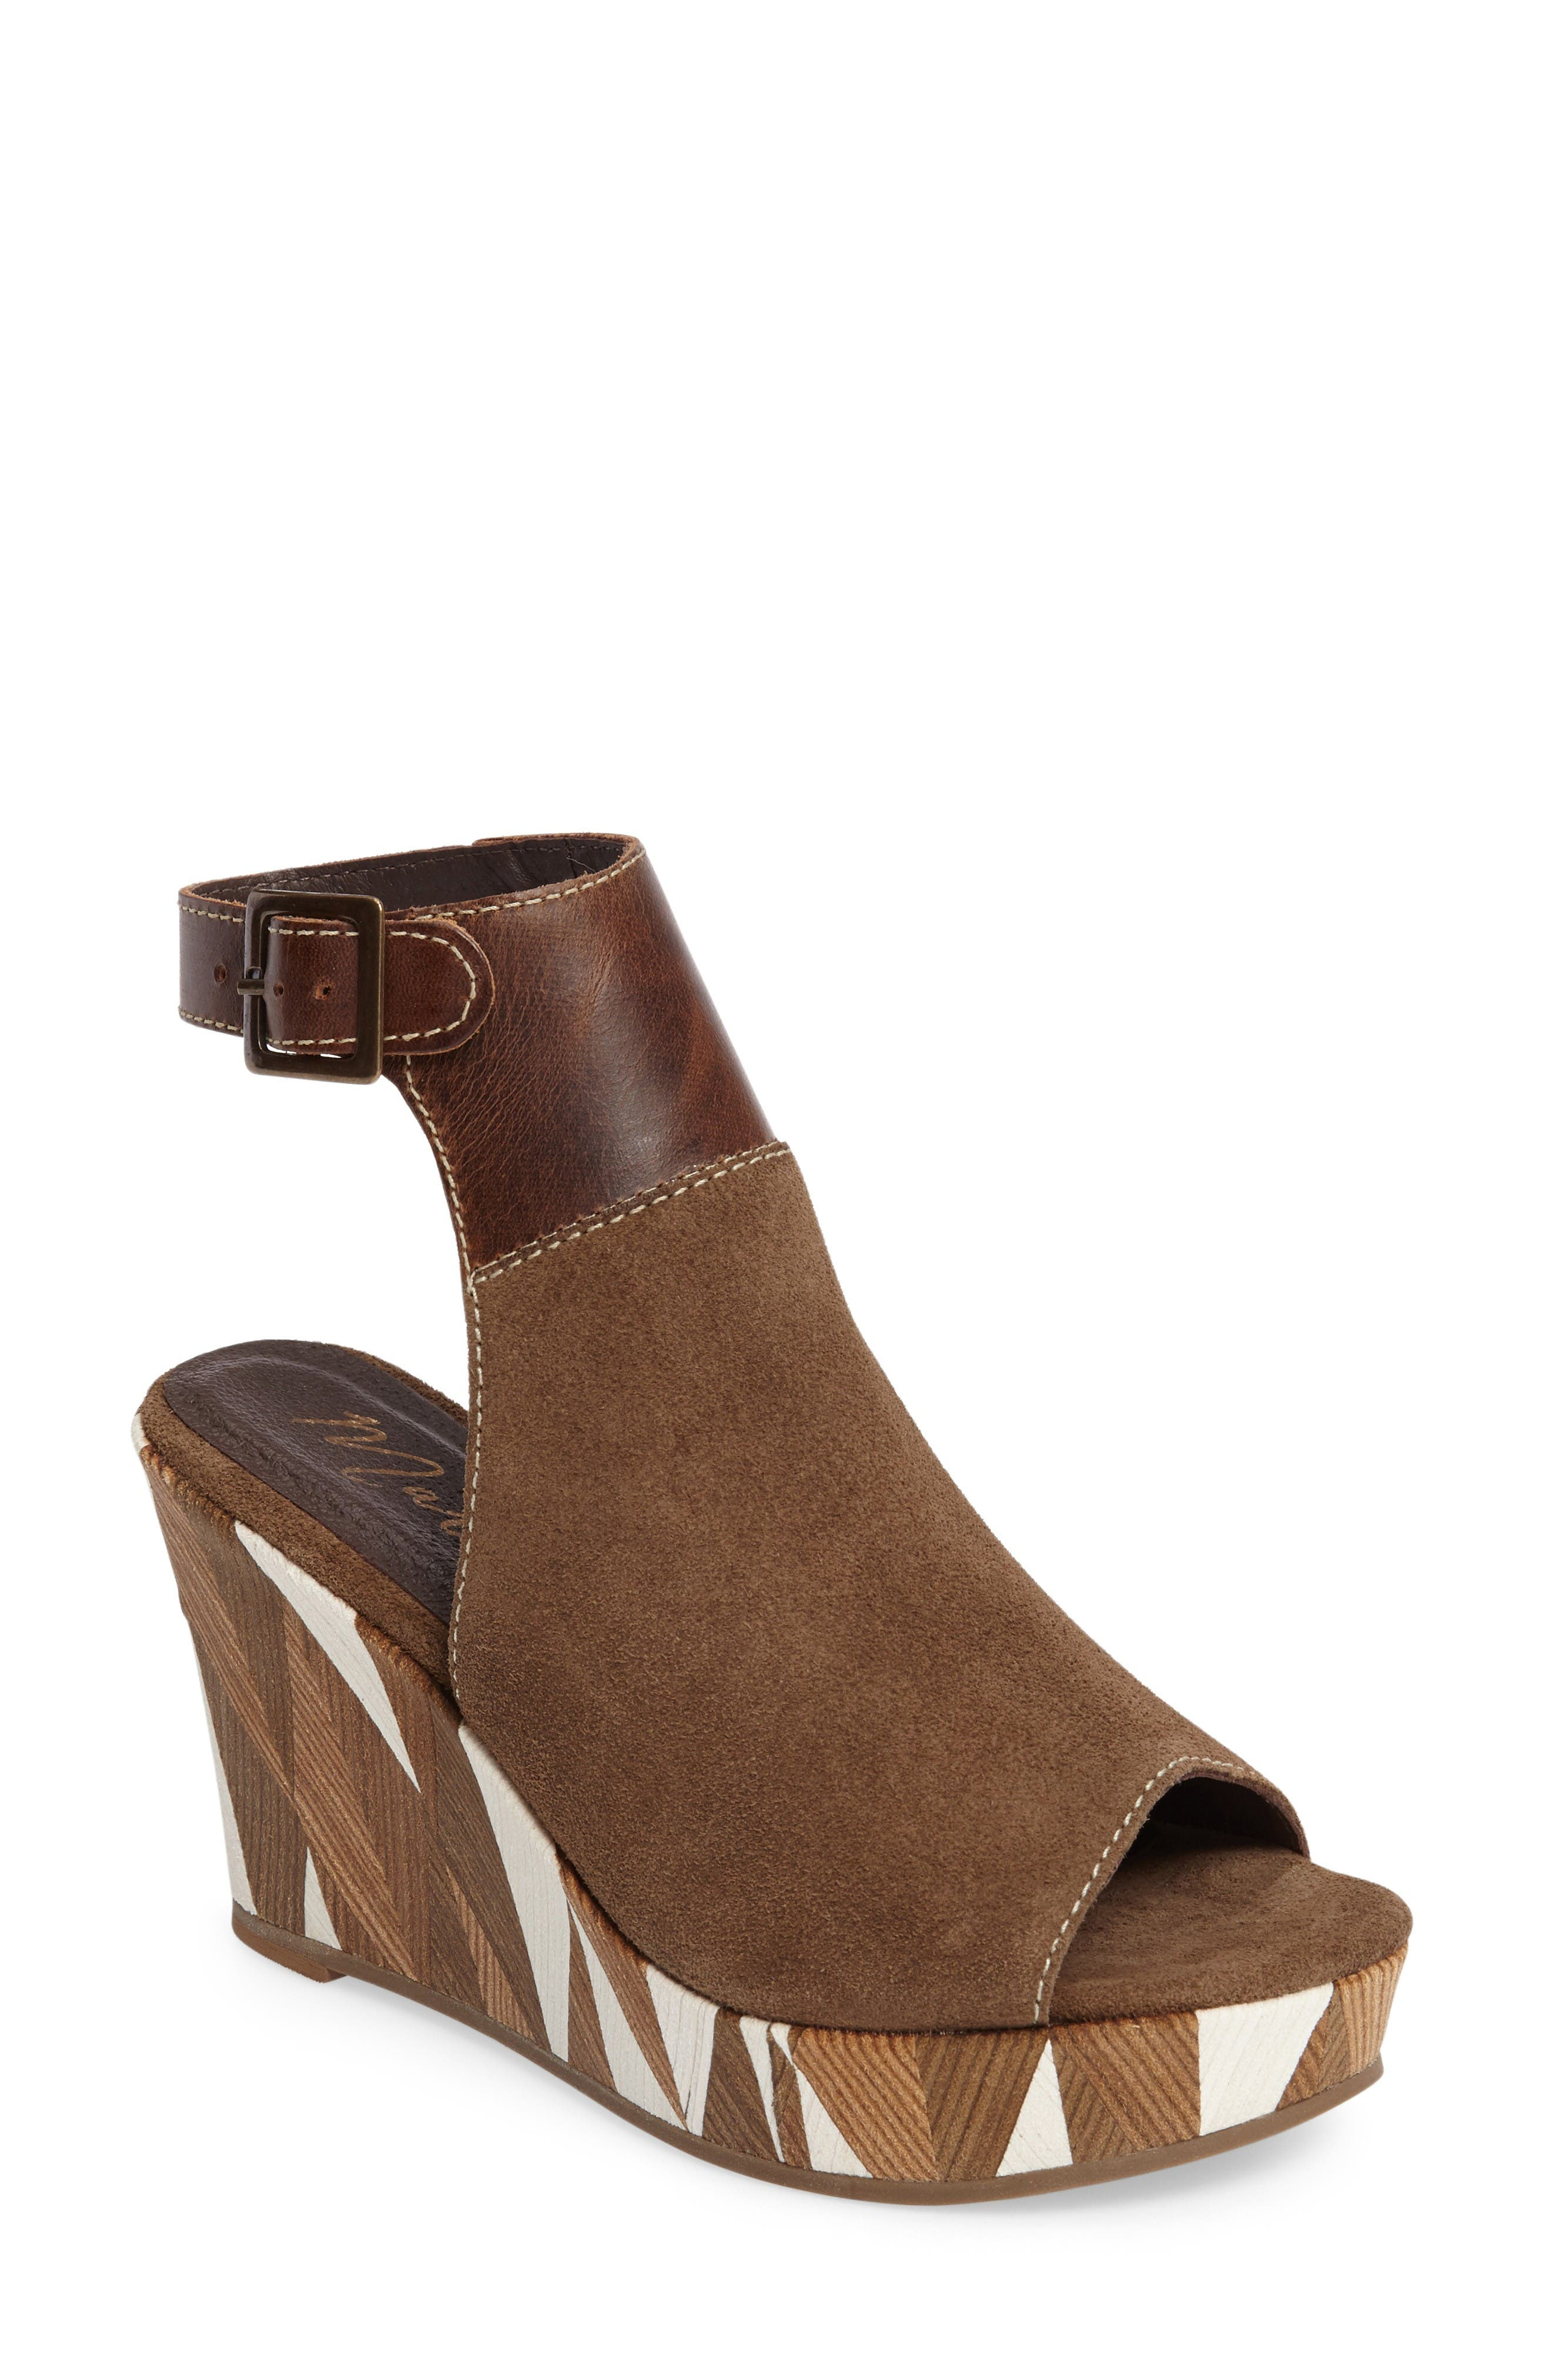 Alternate Image 1 Selected - Matisse Harlequin Wedge Sandal (Women)